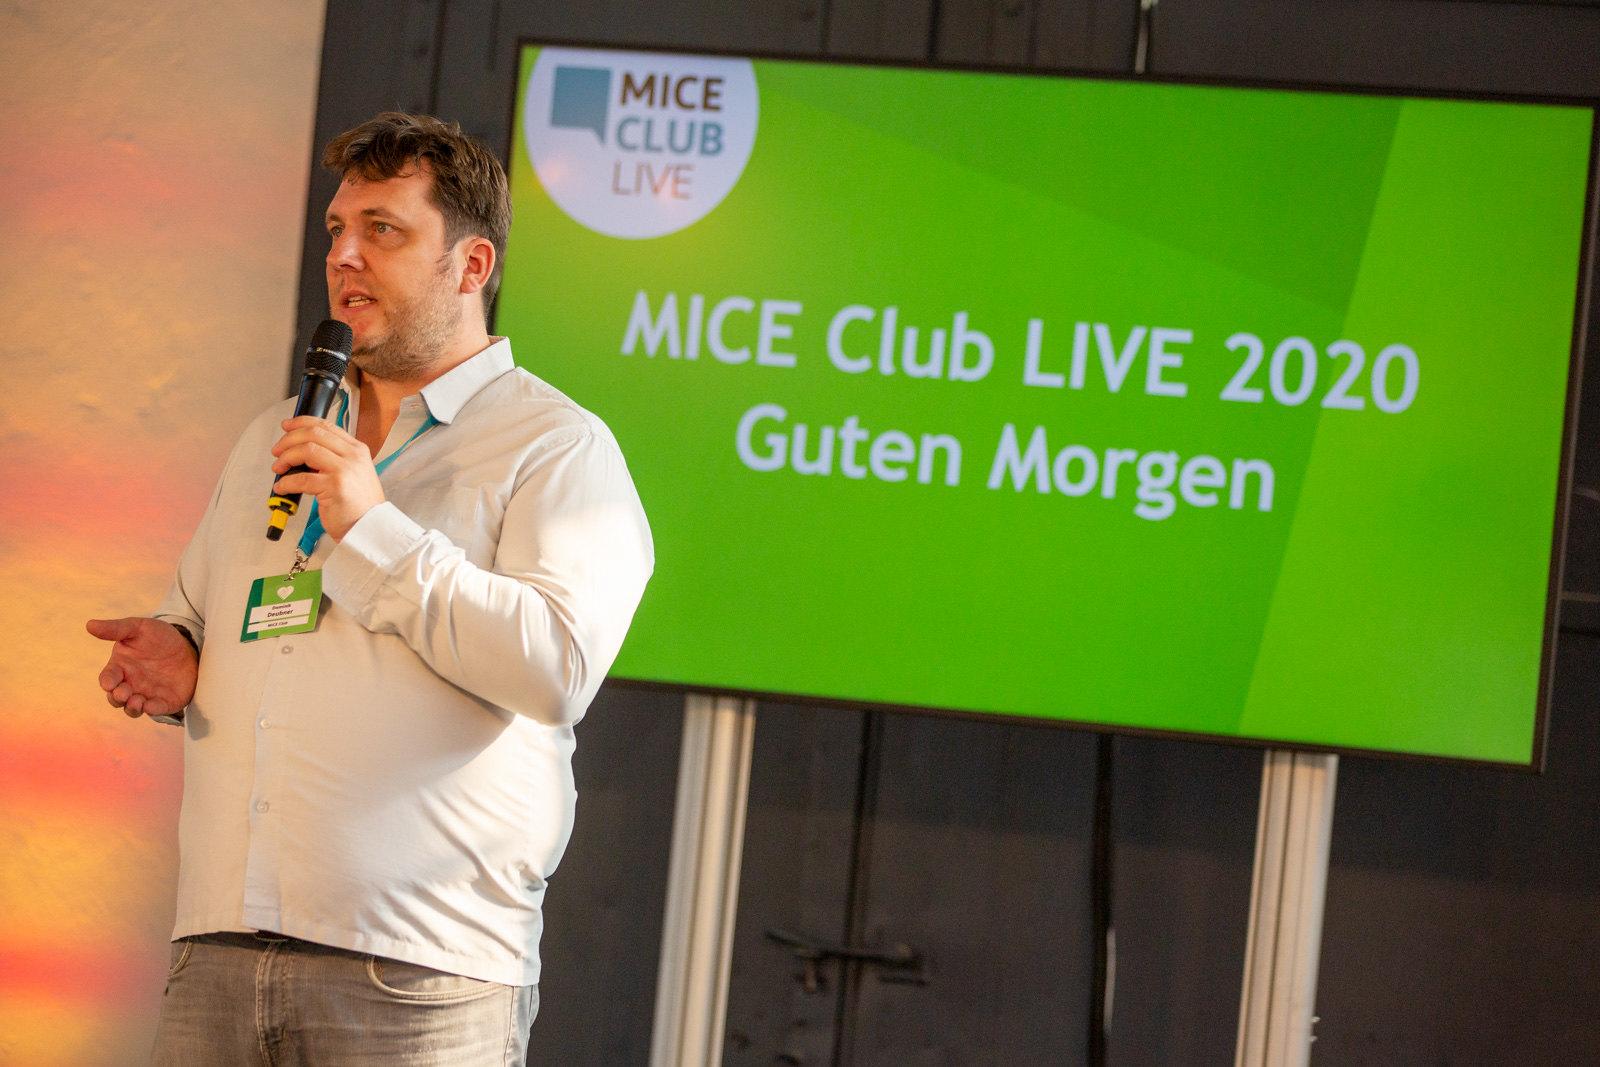 MICE Club LIVE 2020